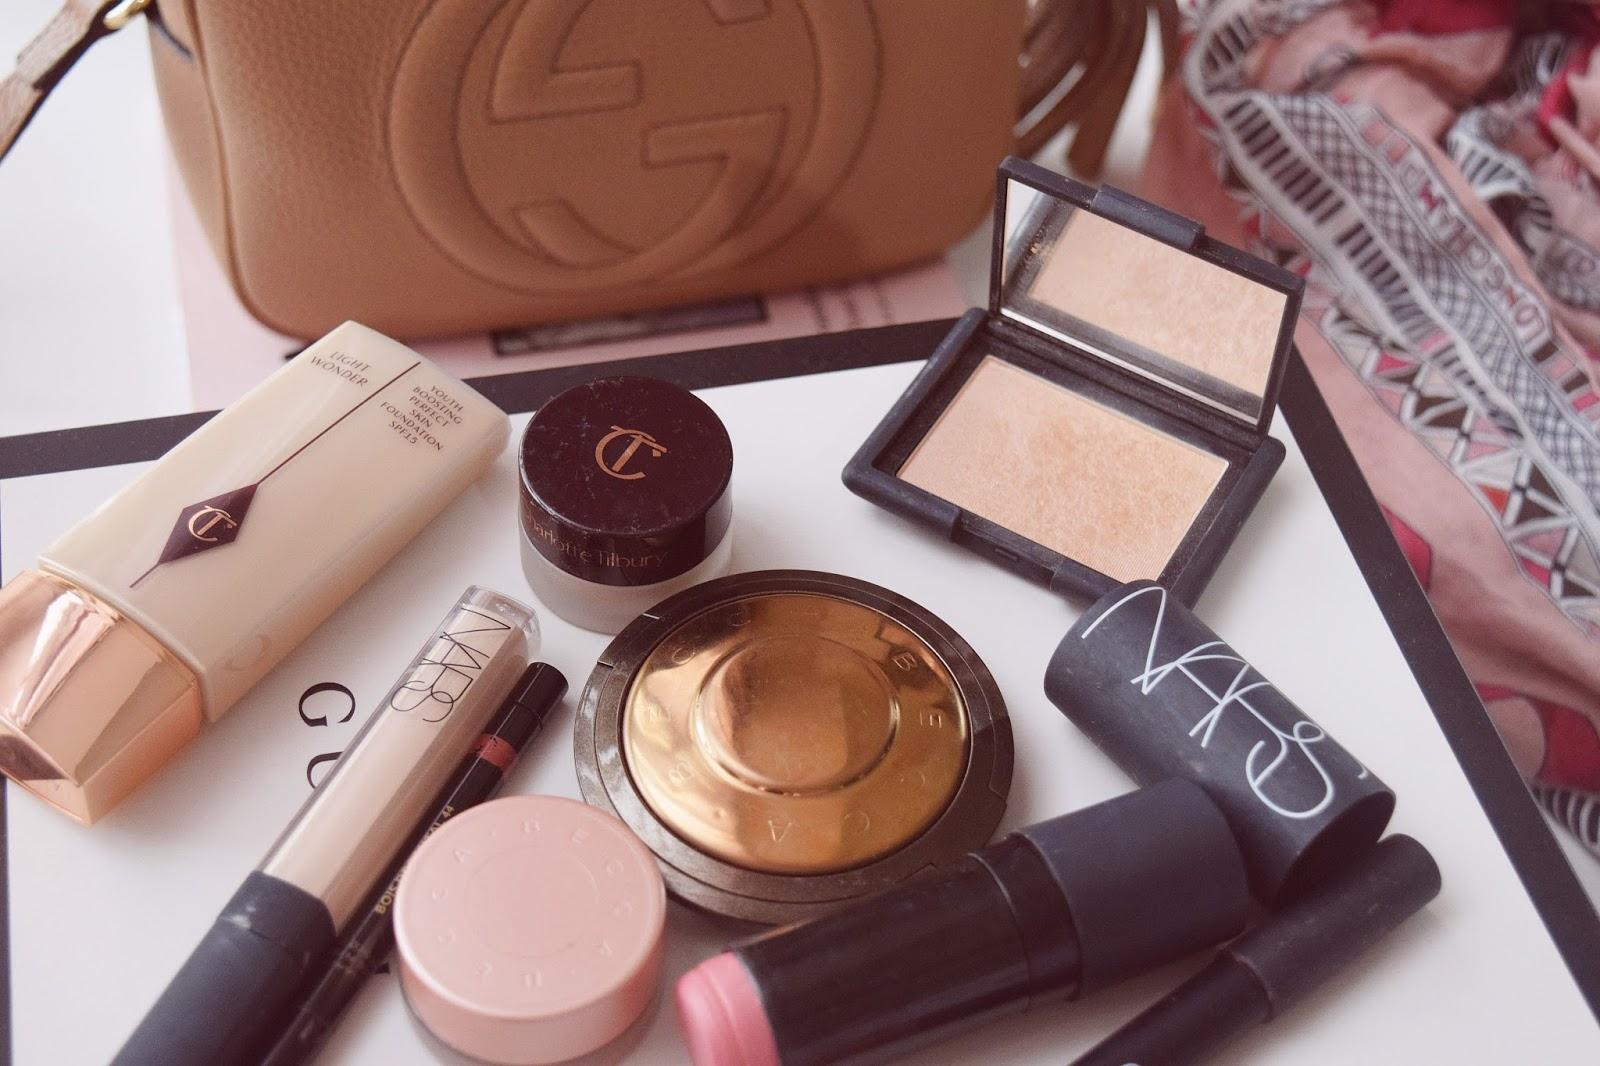 makeup favorites 2017, nars favorites, becca favorites